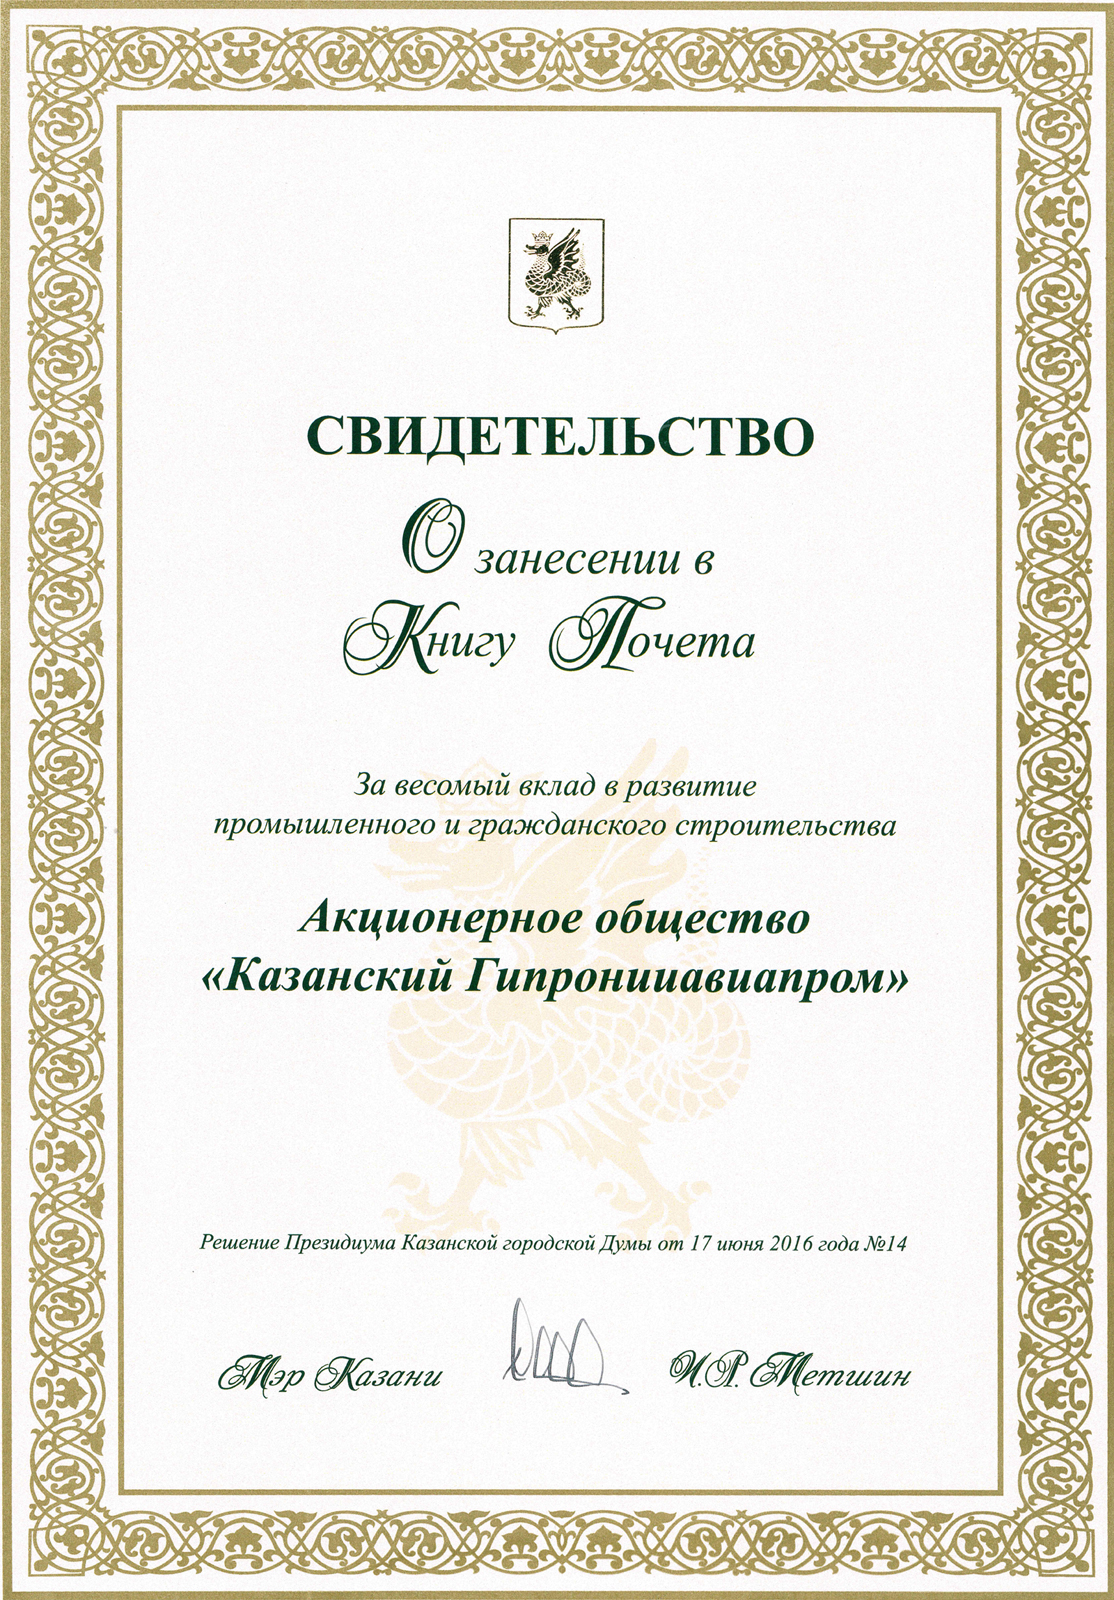 "АО ""Казанский Гипронииавиапром"" занесен в книгу почета г.Казани"